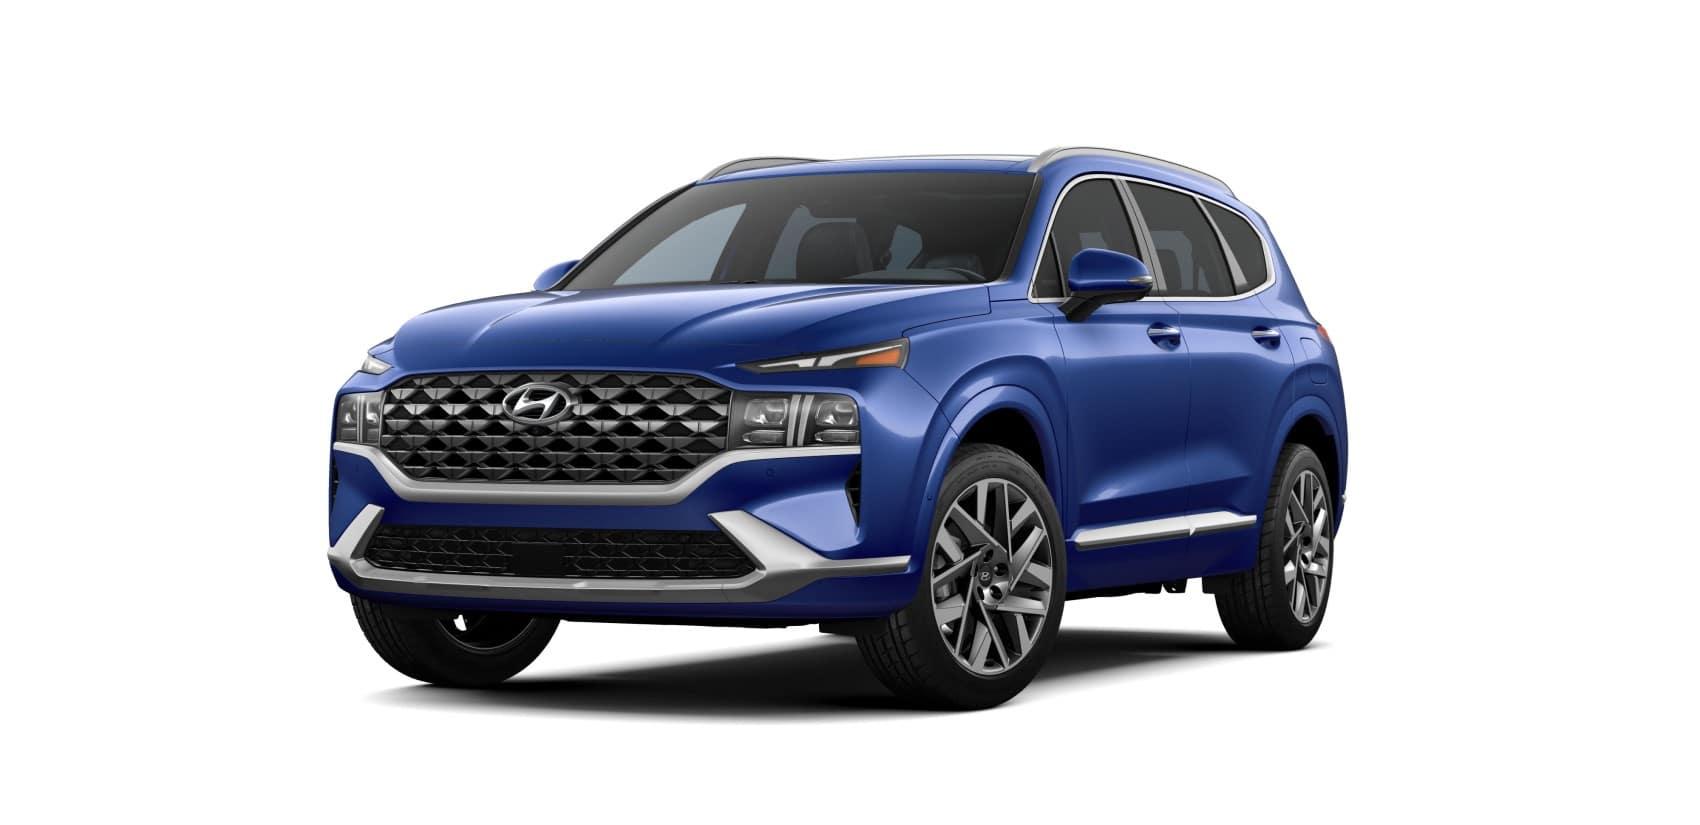 Hyundai Santa Fe Stormy Sea Blue